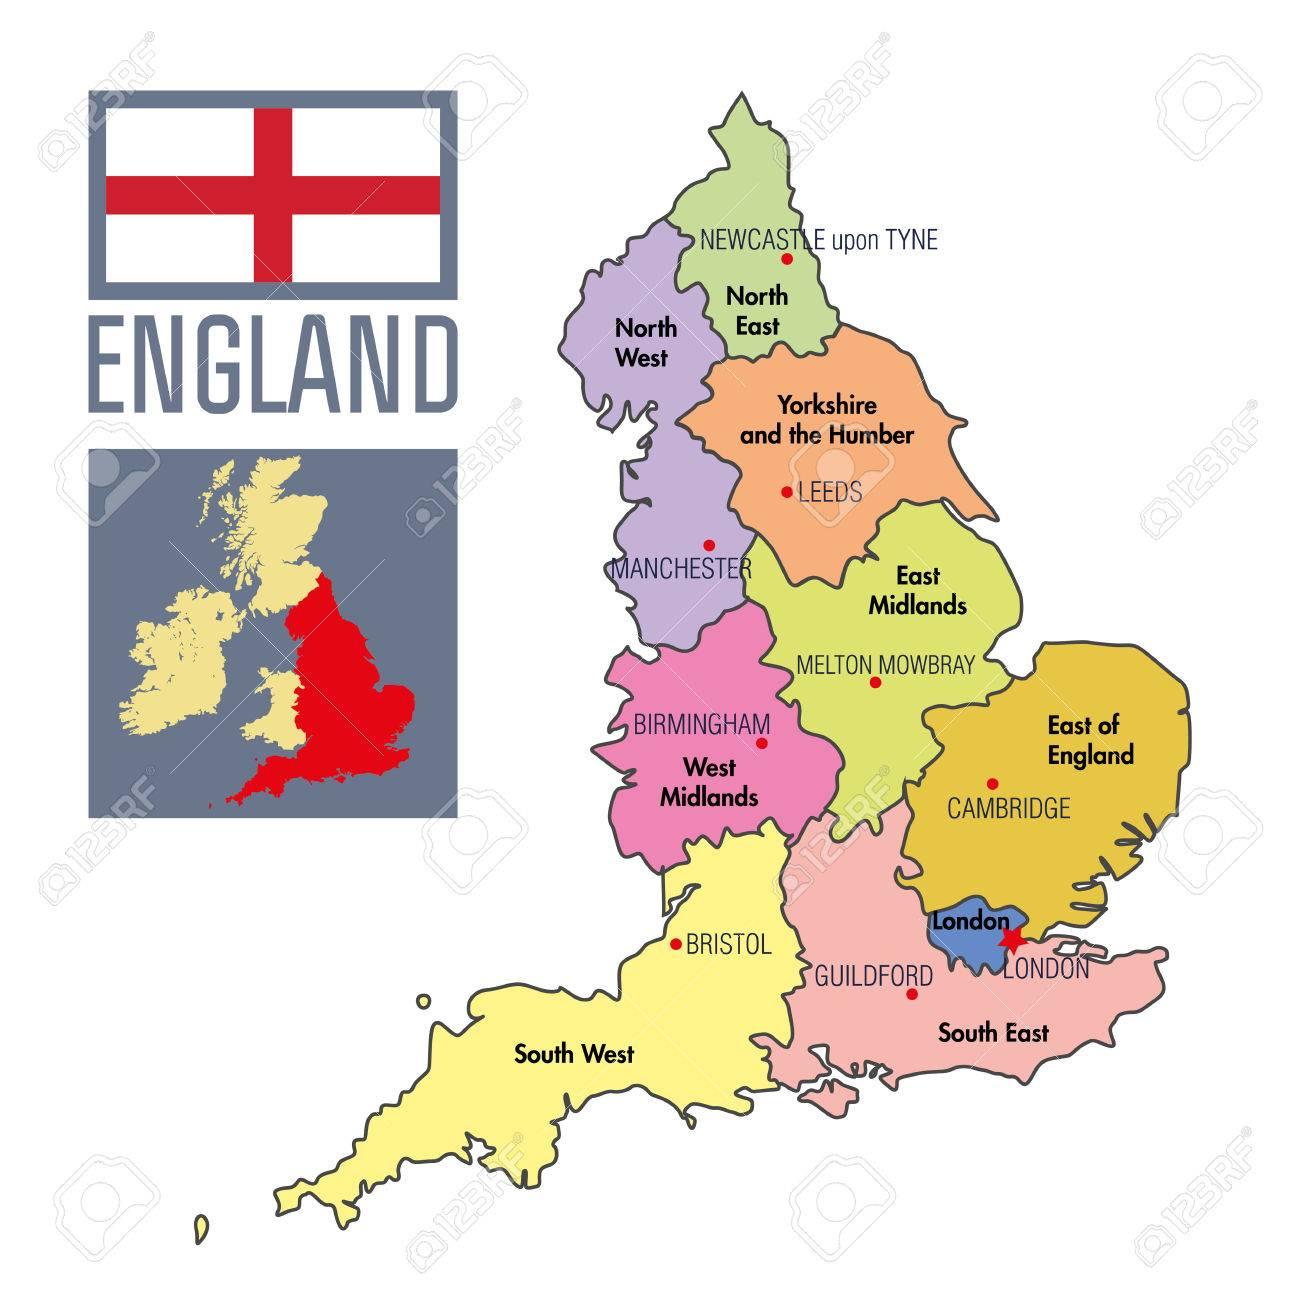 inglaterra no mapa Vector Mapa Político Altamente Detallado De Inglaterra Con Las  inglaterra no mapa